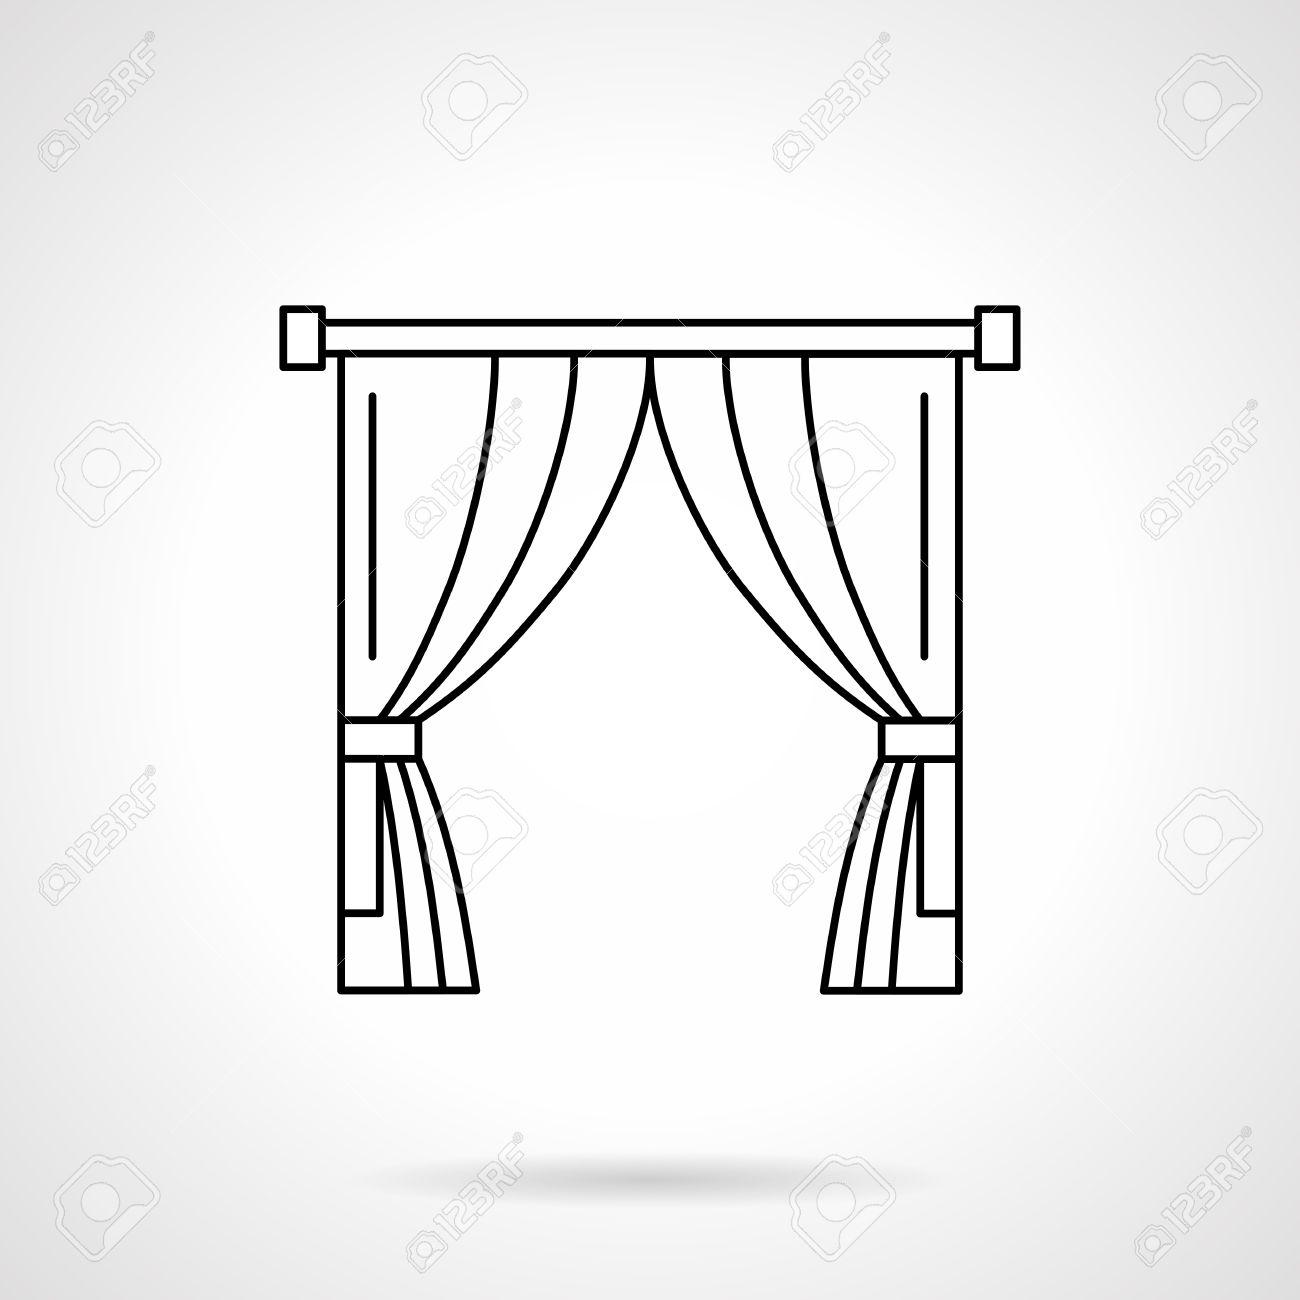 https://previews.123rf.com/images/yershovoleksandr/yershovoleksandr1606/yershovoleksandr160600190/58506846-abstracte-teken-van-theater-gordijn-scene-kleding-element-premi%C3%A8re-voorstelling-gordijnen-gordijnen-en.jpg